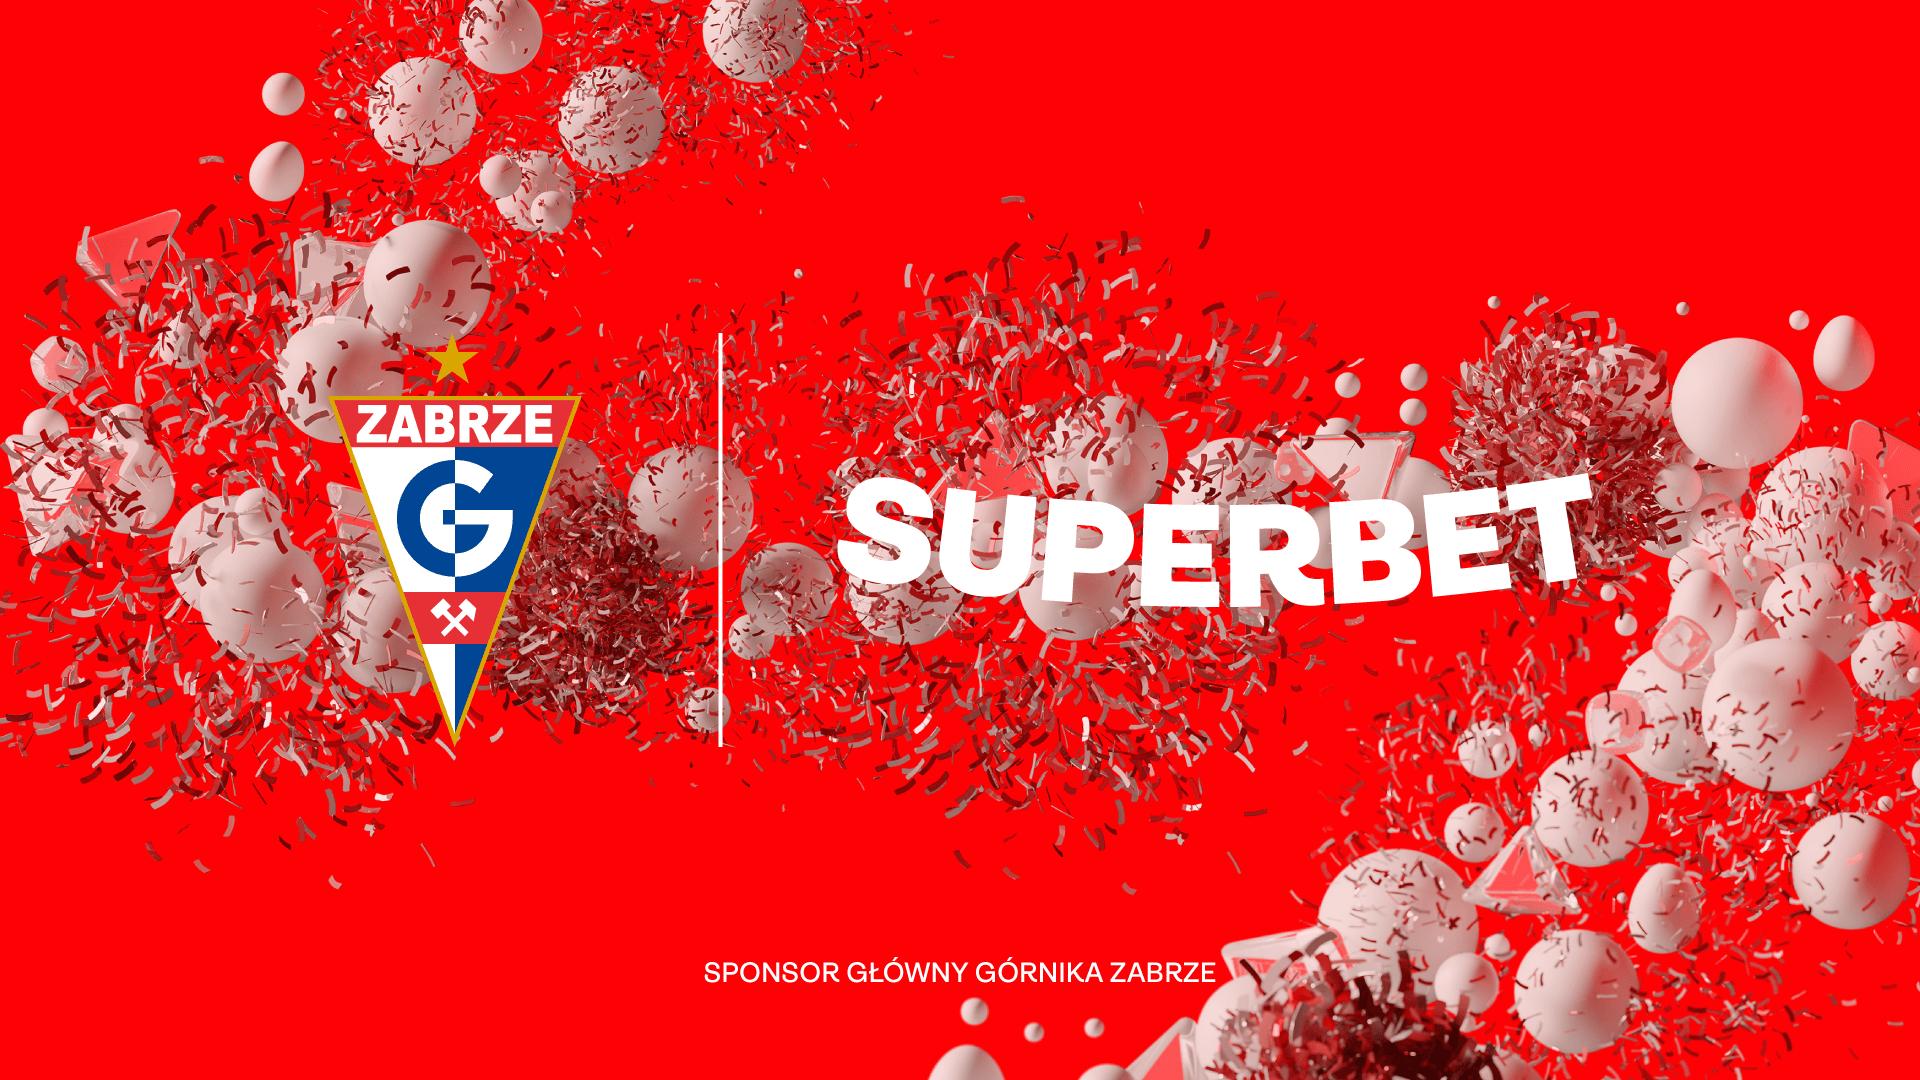 Górnik Zabrze pozyskał super sponsora